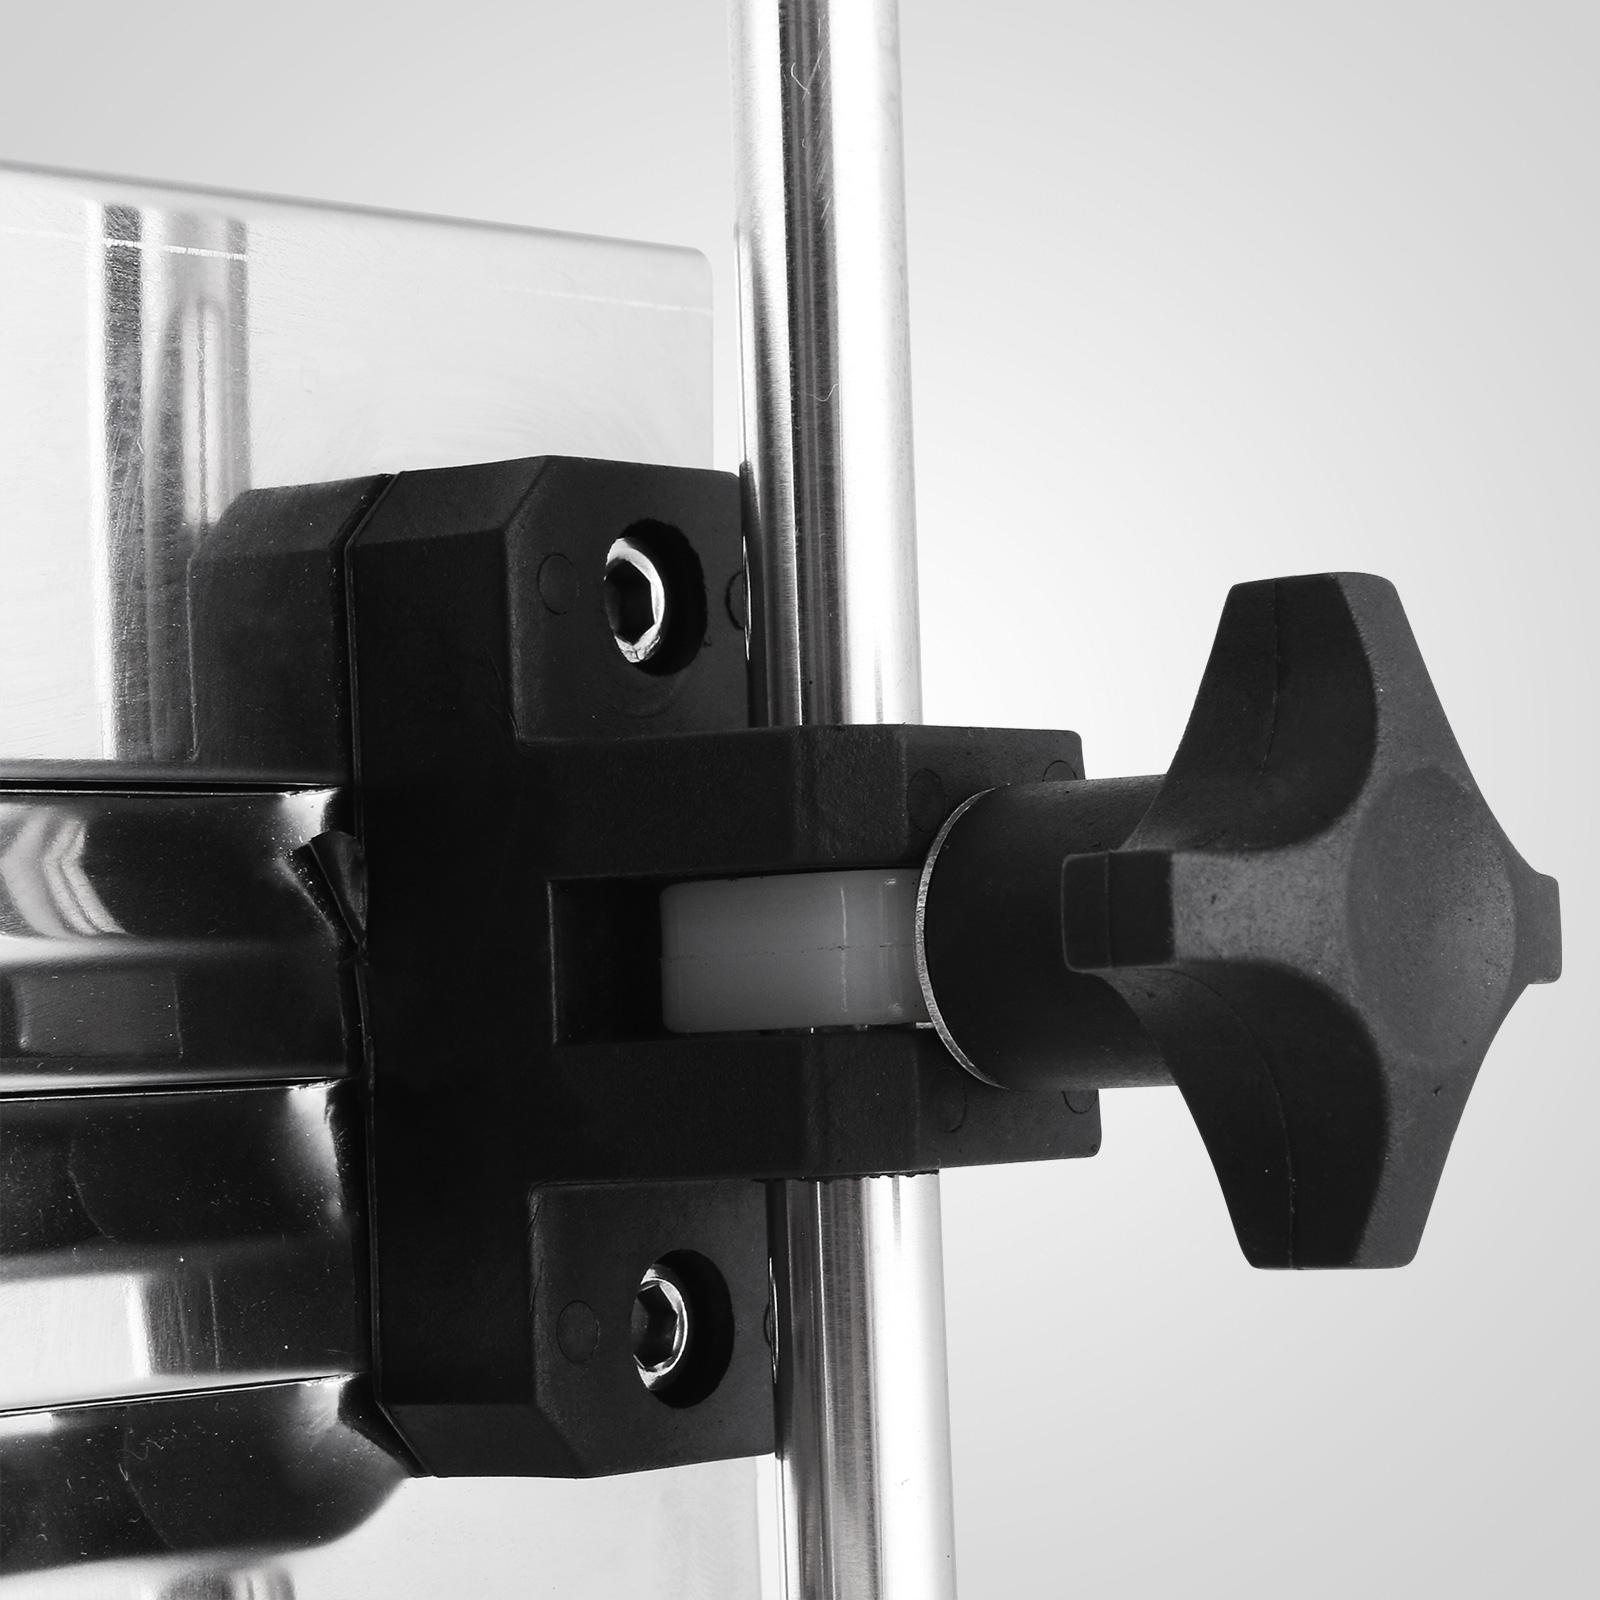 Liquid-Filling-Machine-Filler-Remplissage-2-3500ML-50-500ML-INDUSTRY-SUPPLY miniature 45